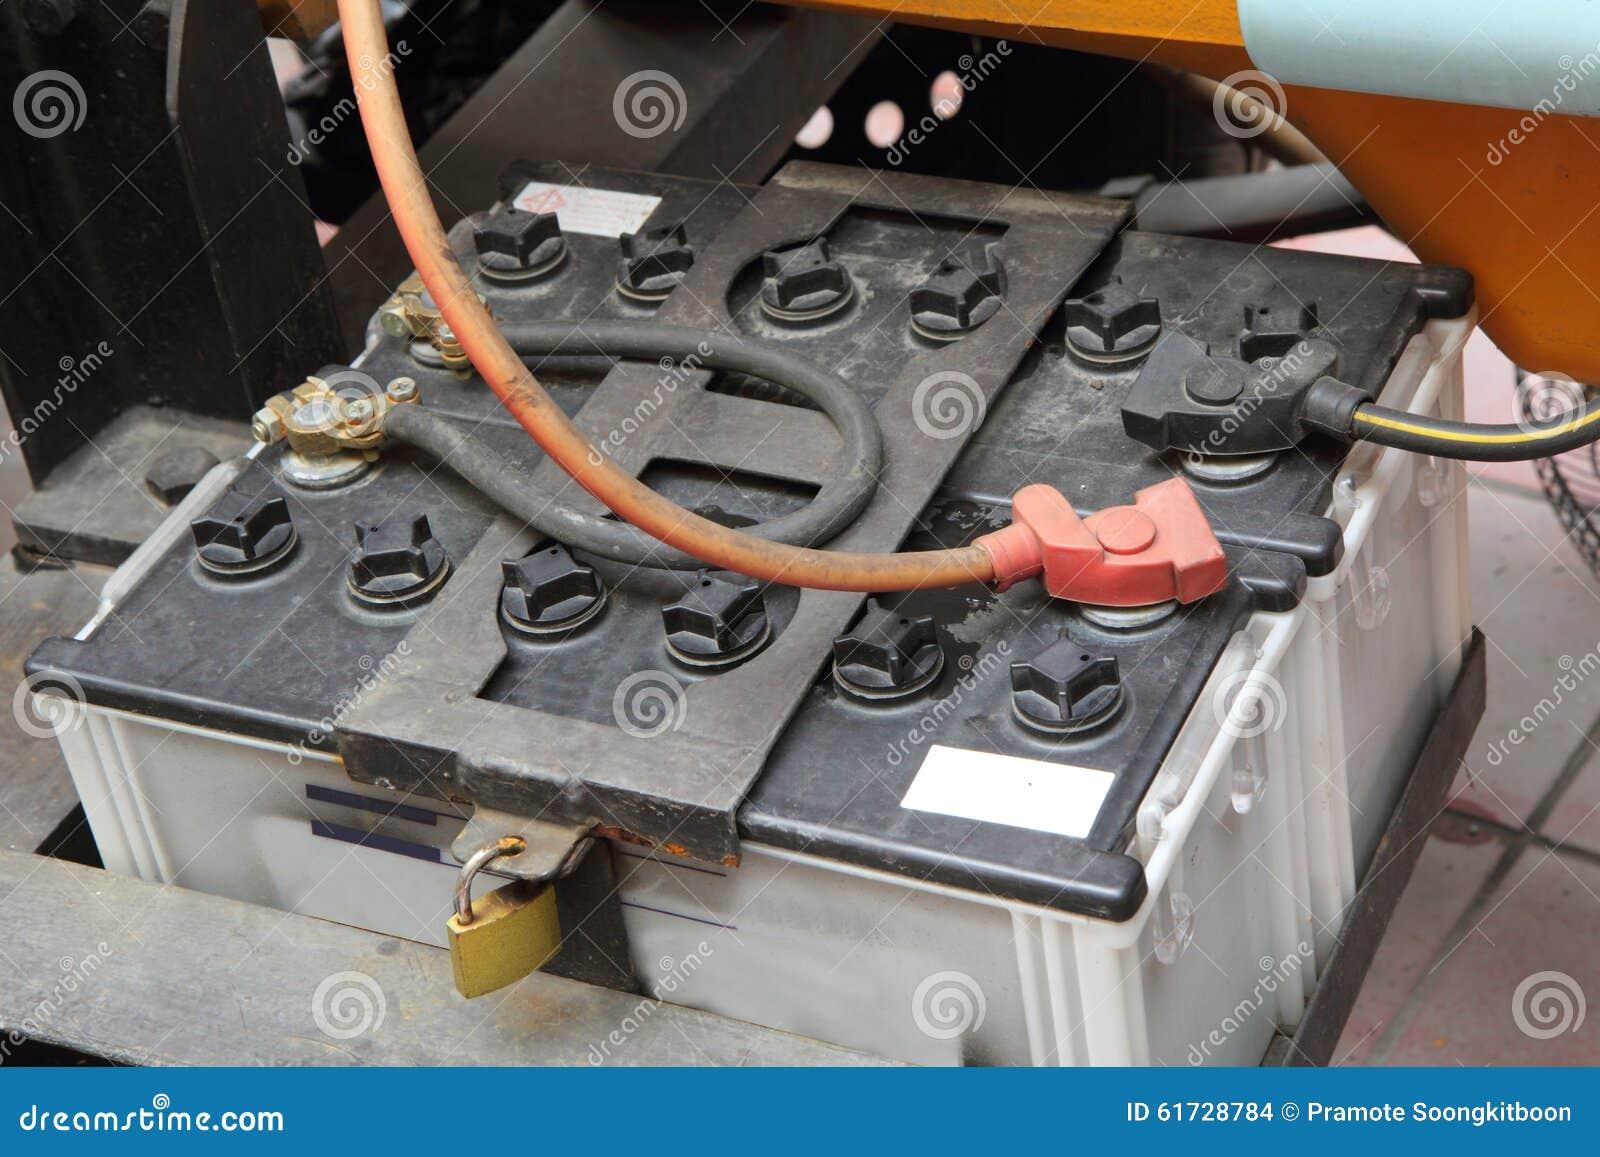 old car battery stock photo image 61728784. Black Bedroom Furniture Sets. Home Design Ideas